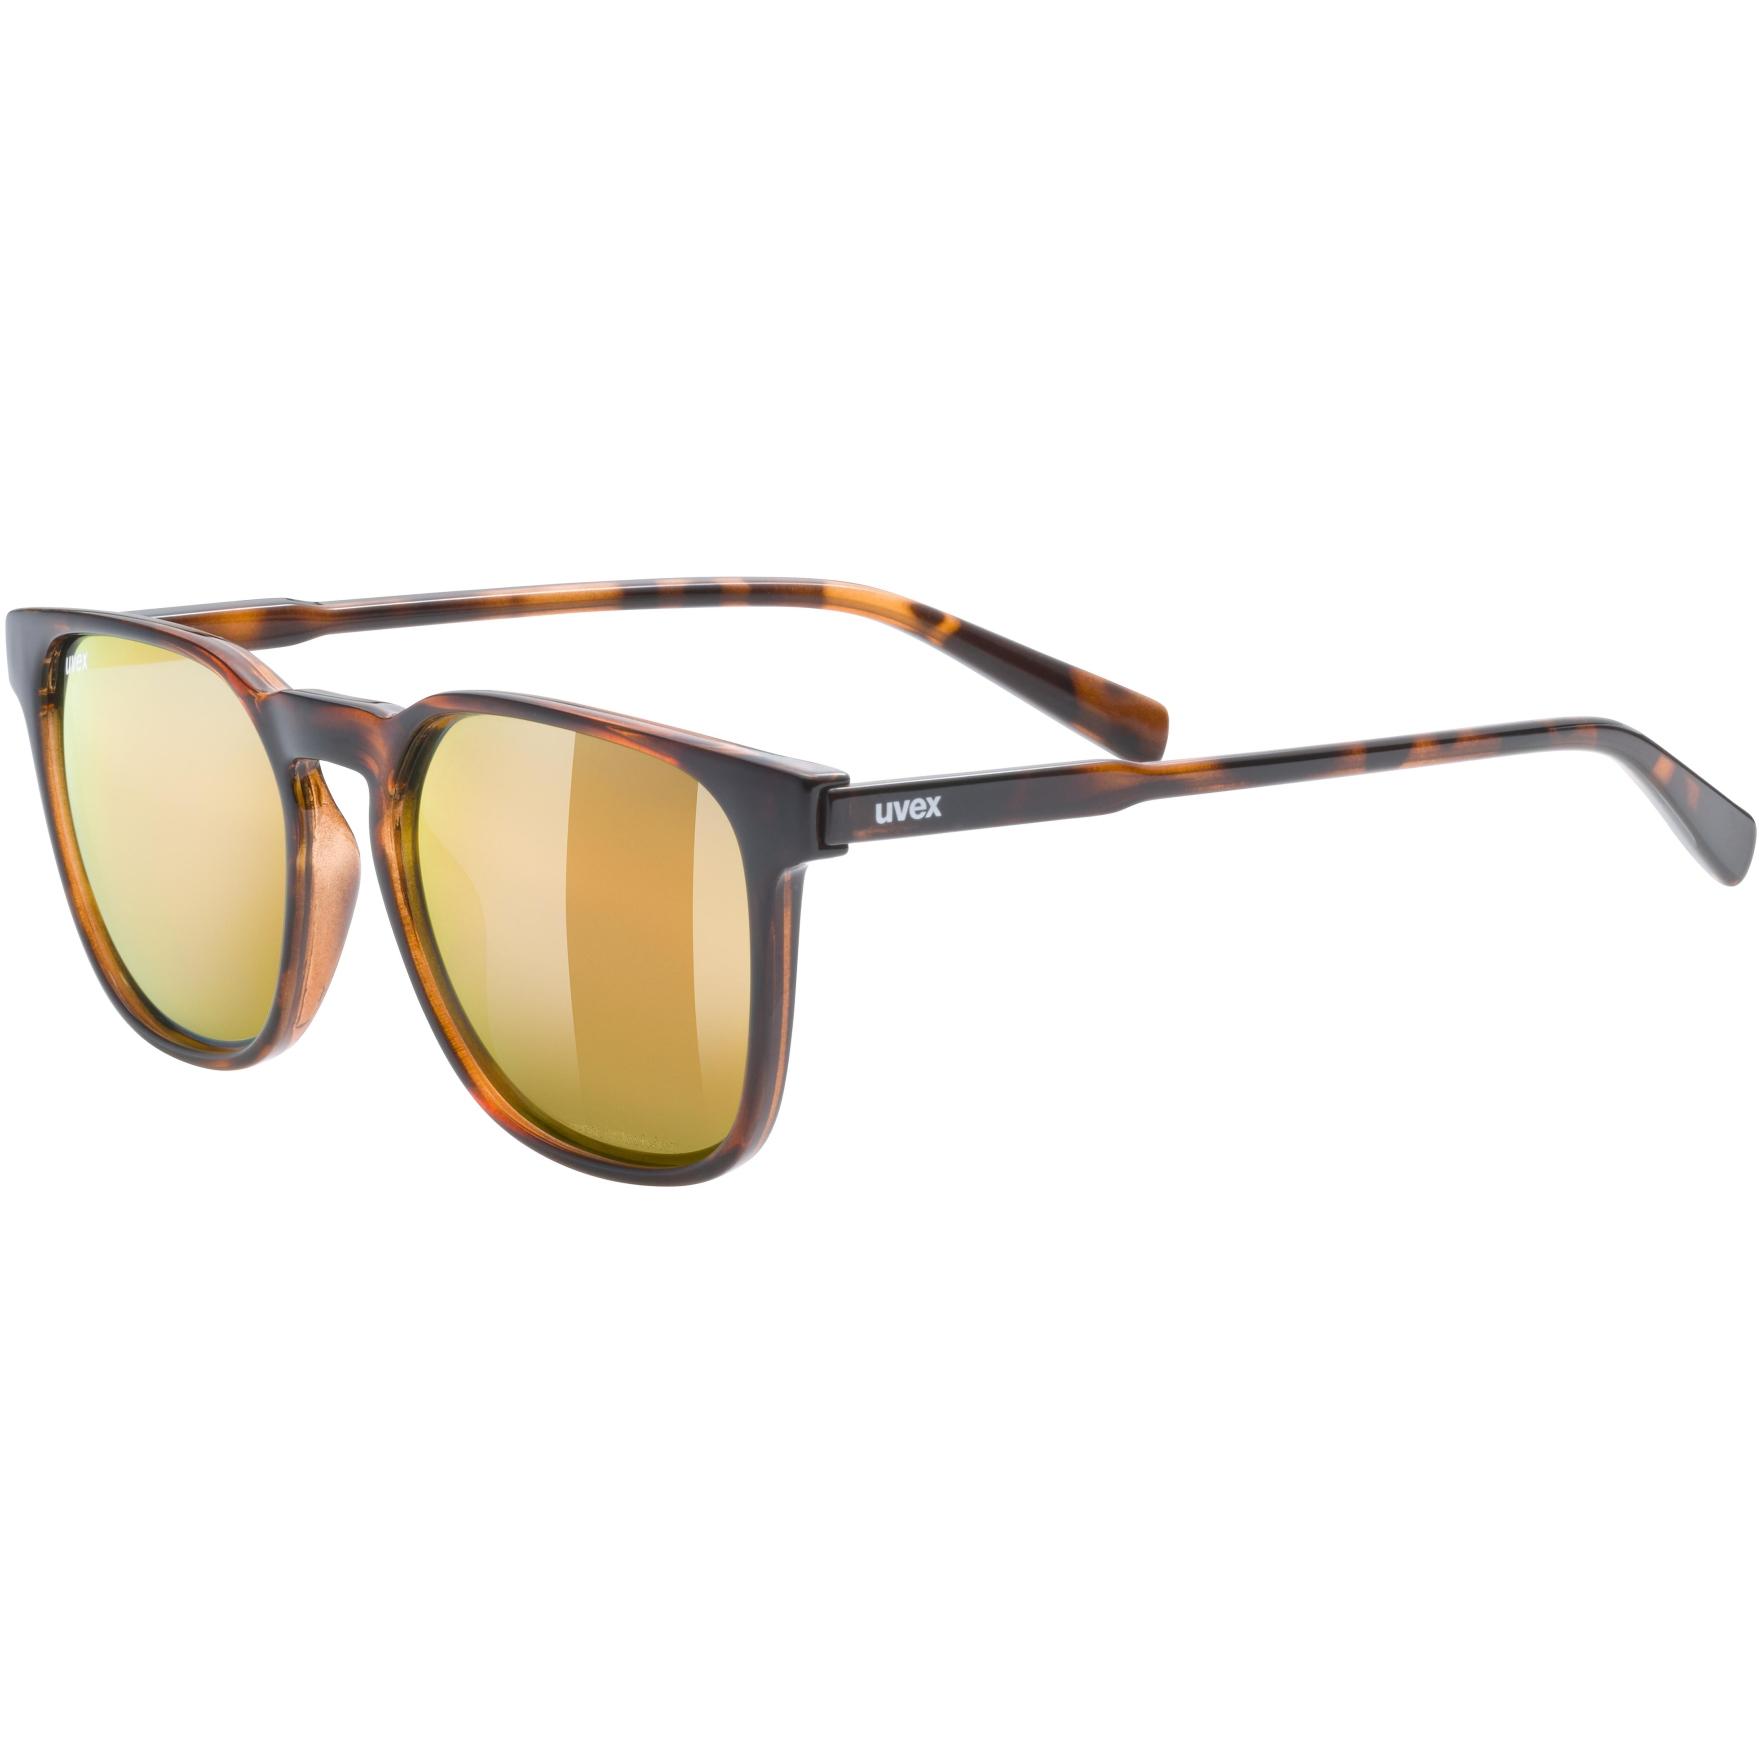 Image of Uvex lgl 49 P Glasses - havanna/polavision mirror gold